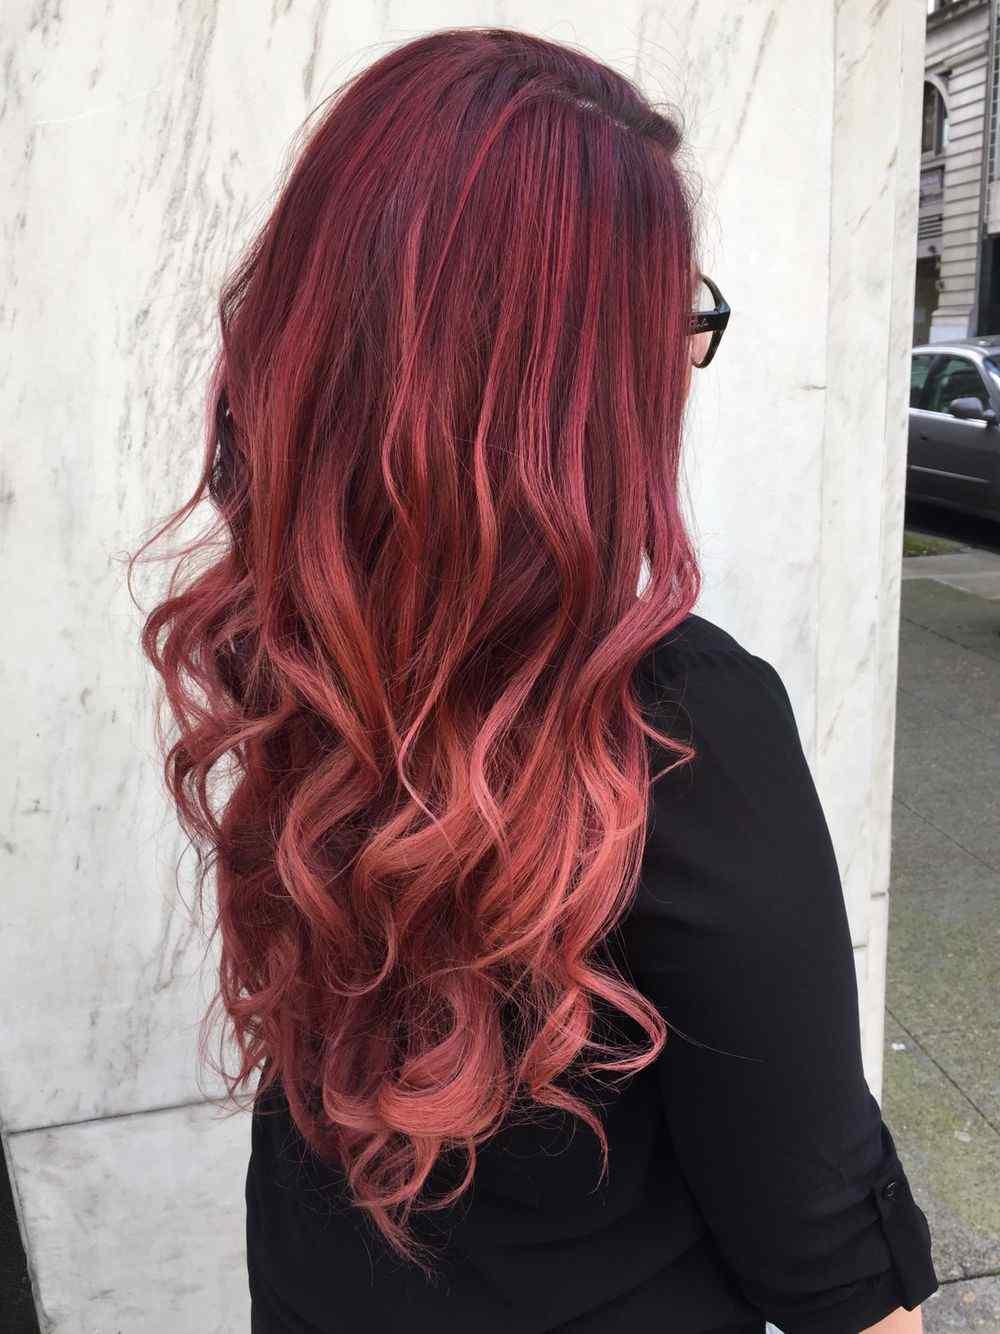 Balayage Rot Haartrend dunkelrot Haarfarbe pflegen Tipps